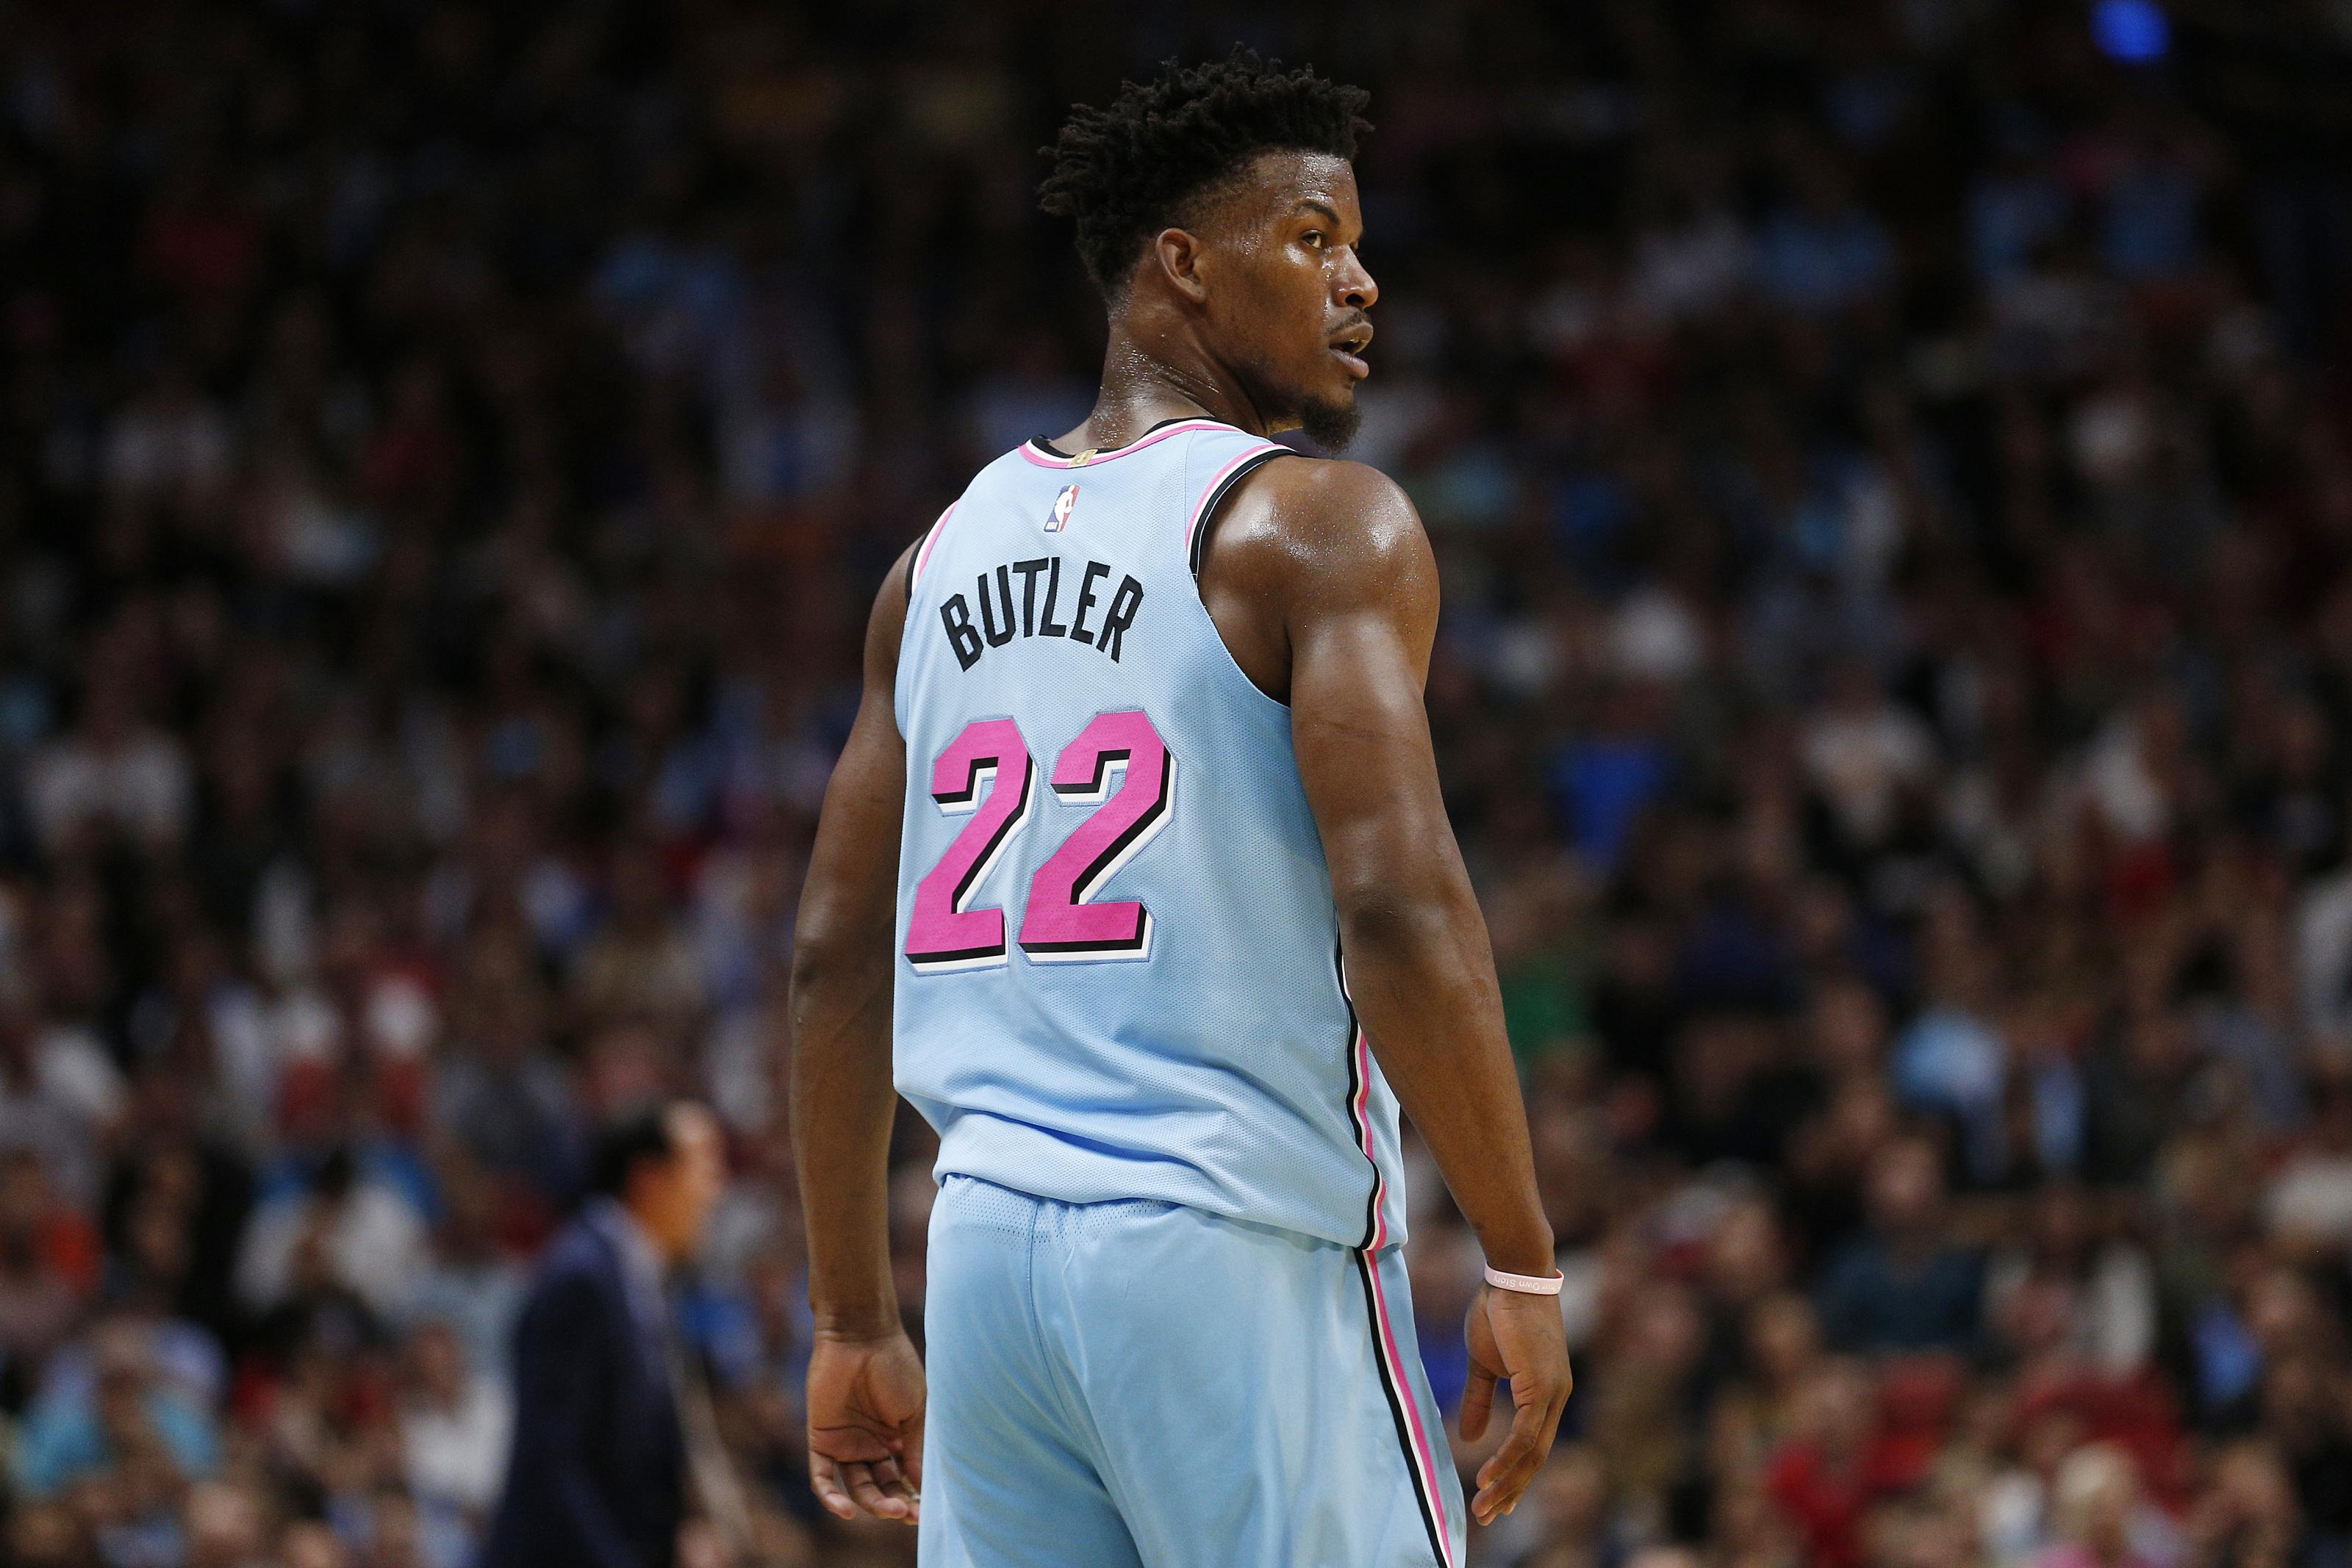 Miami Heat The Jimmy Butler Vs Nba Jersey Saga Should Be A Bigger Deal